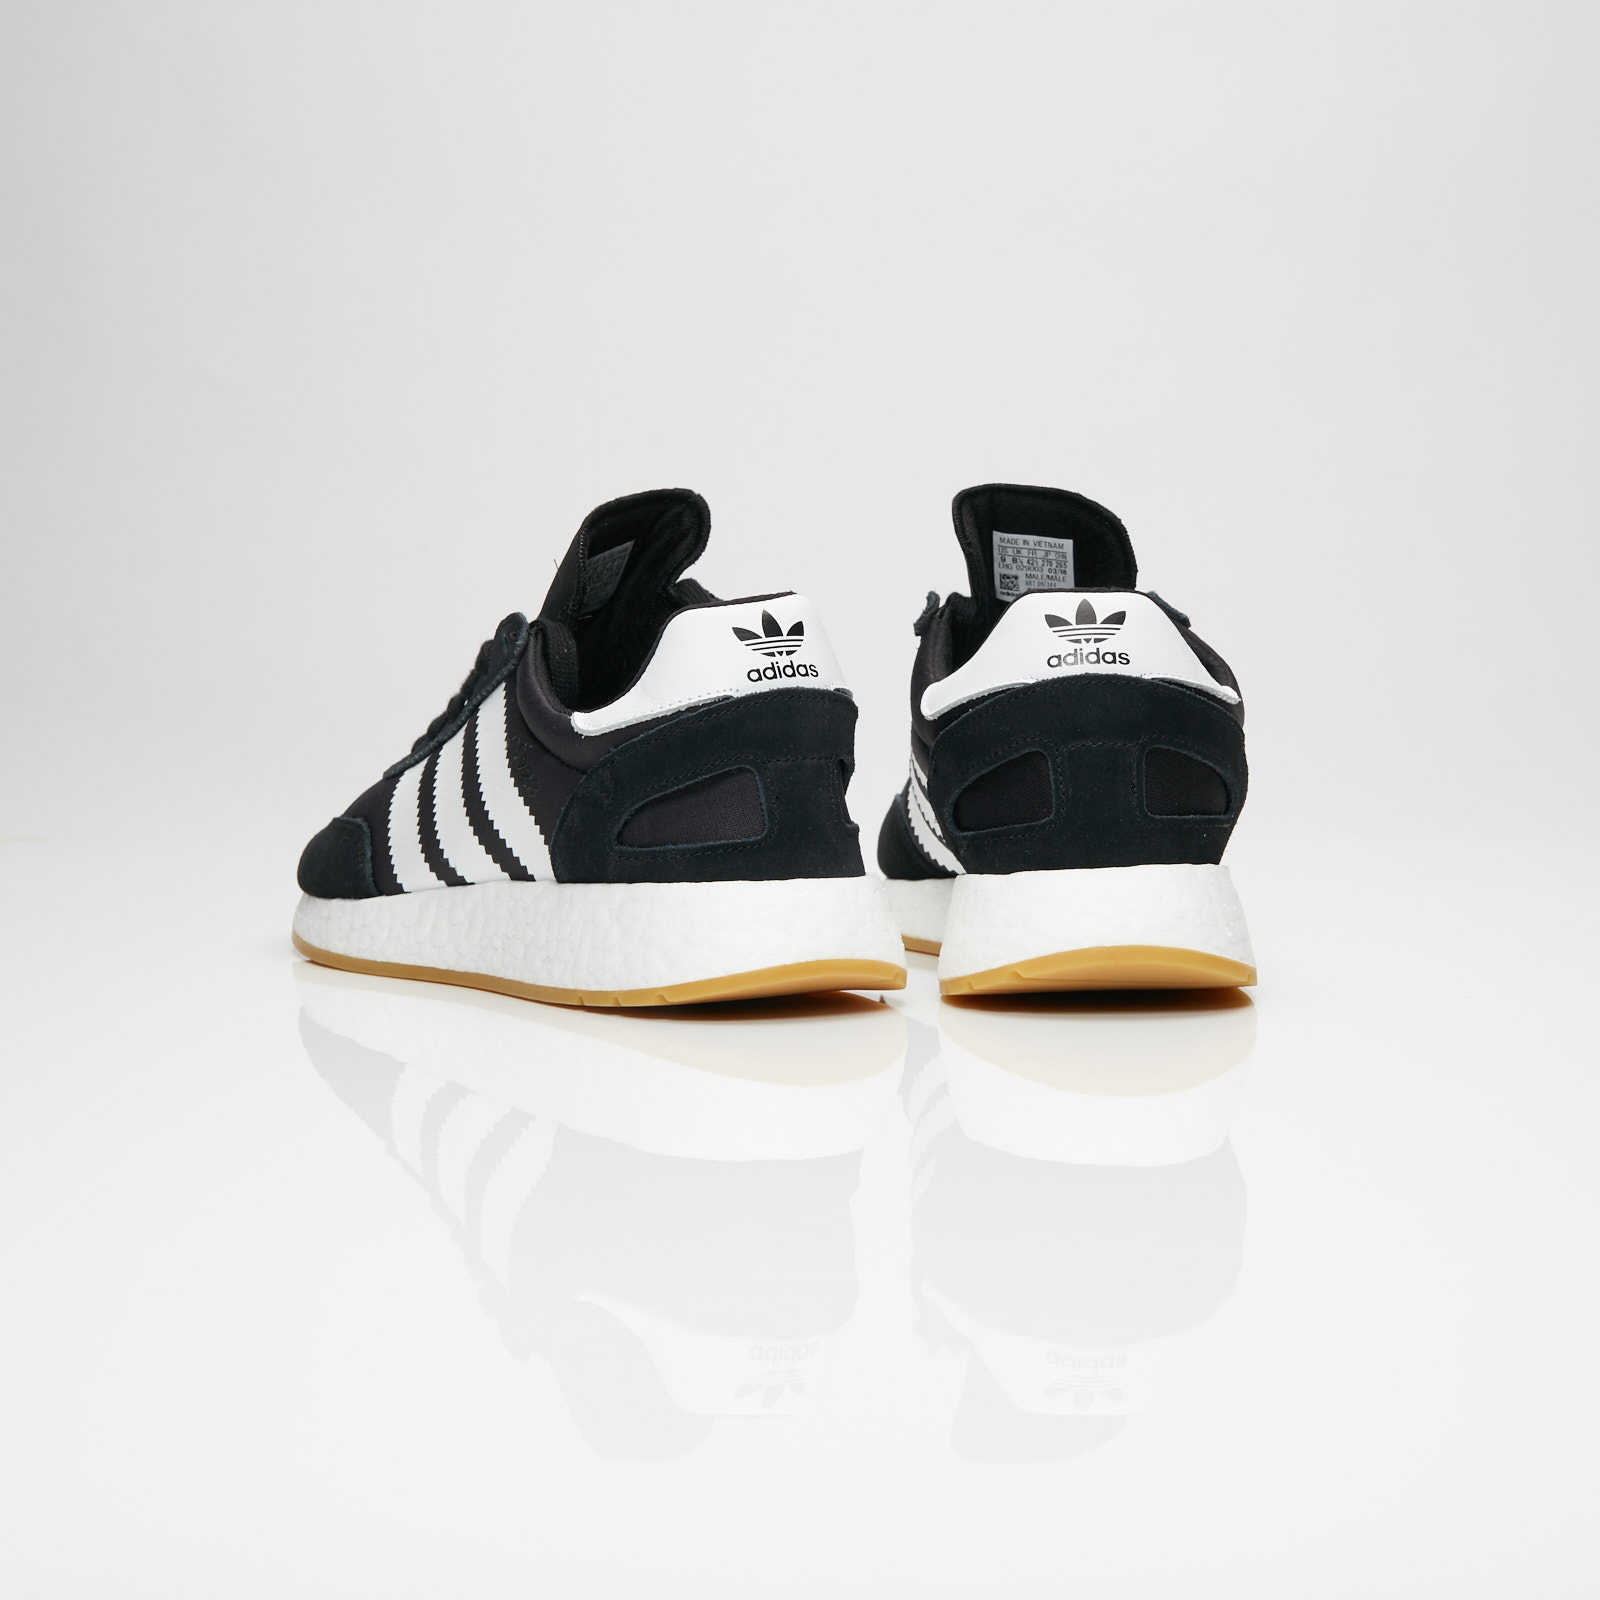 low priced 3f669 c750e adidas I-5923 - D97344 - Sneakersnstuff   sneakers   streetwear online  since 1999